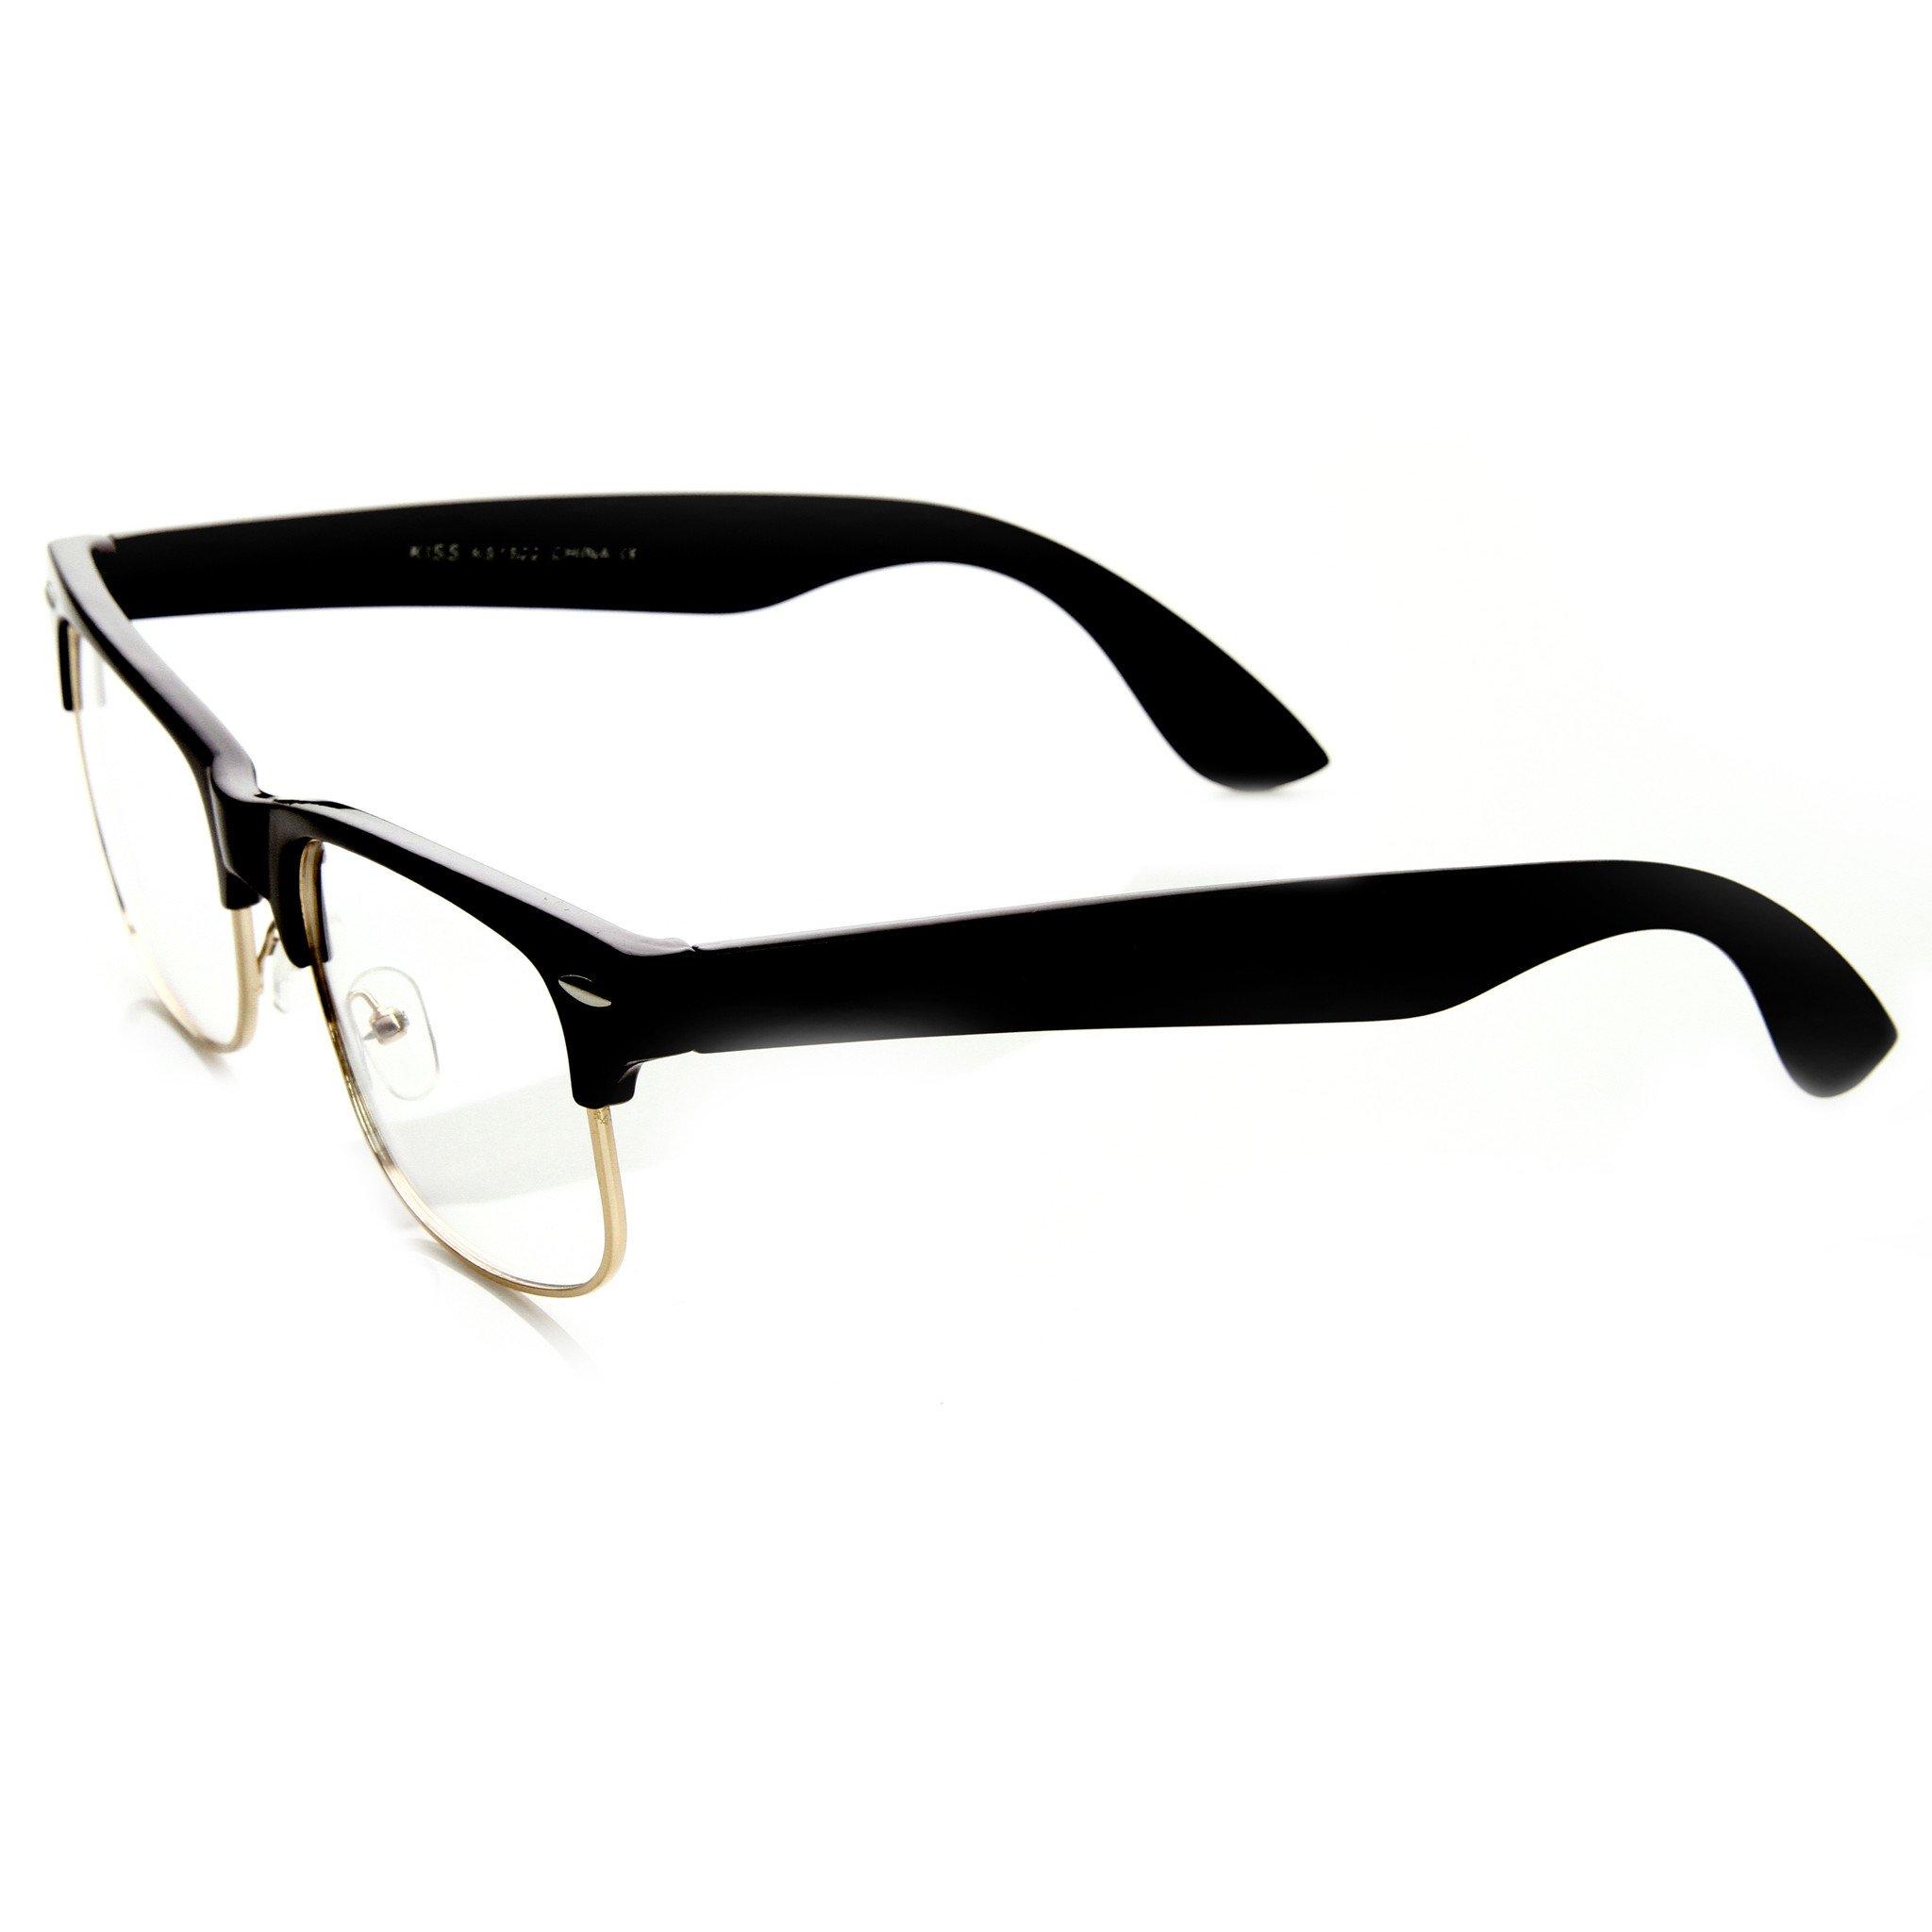 Hipster clipart frame Keywords glasses hipster Hipster Center